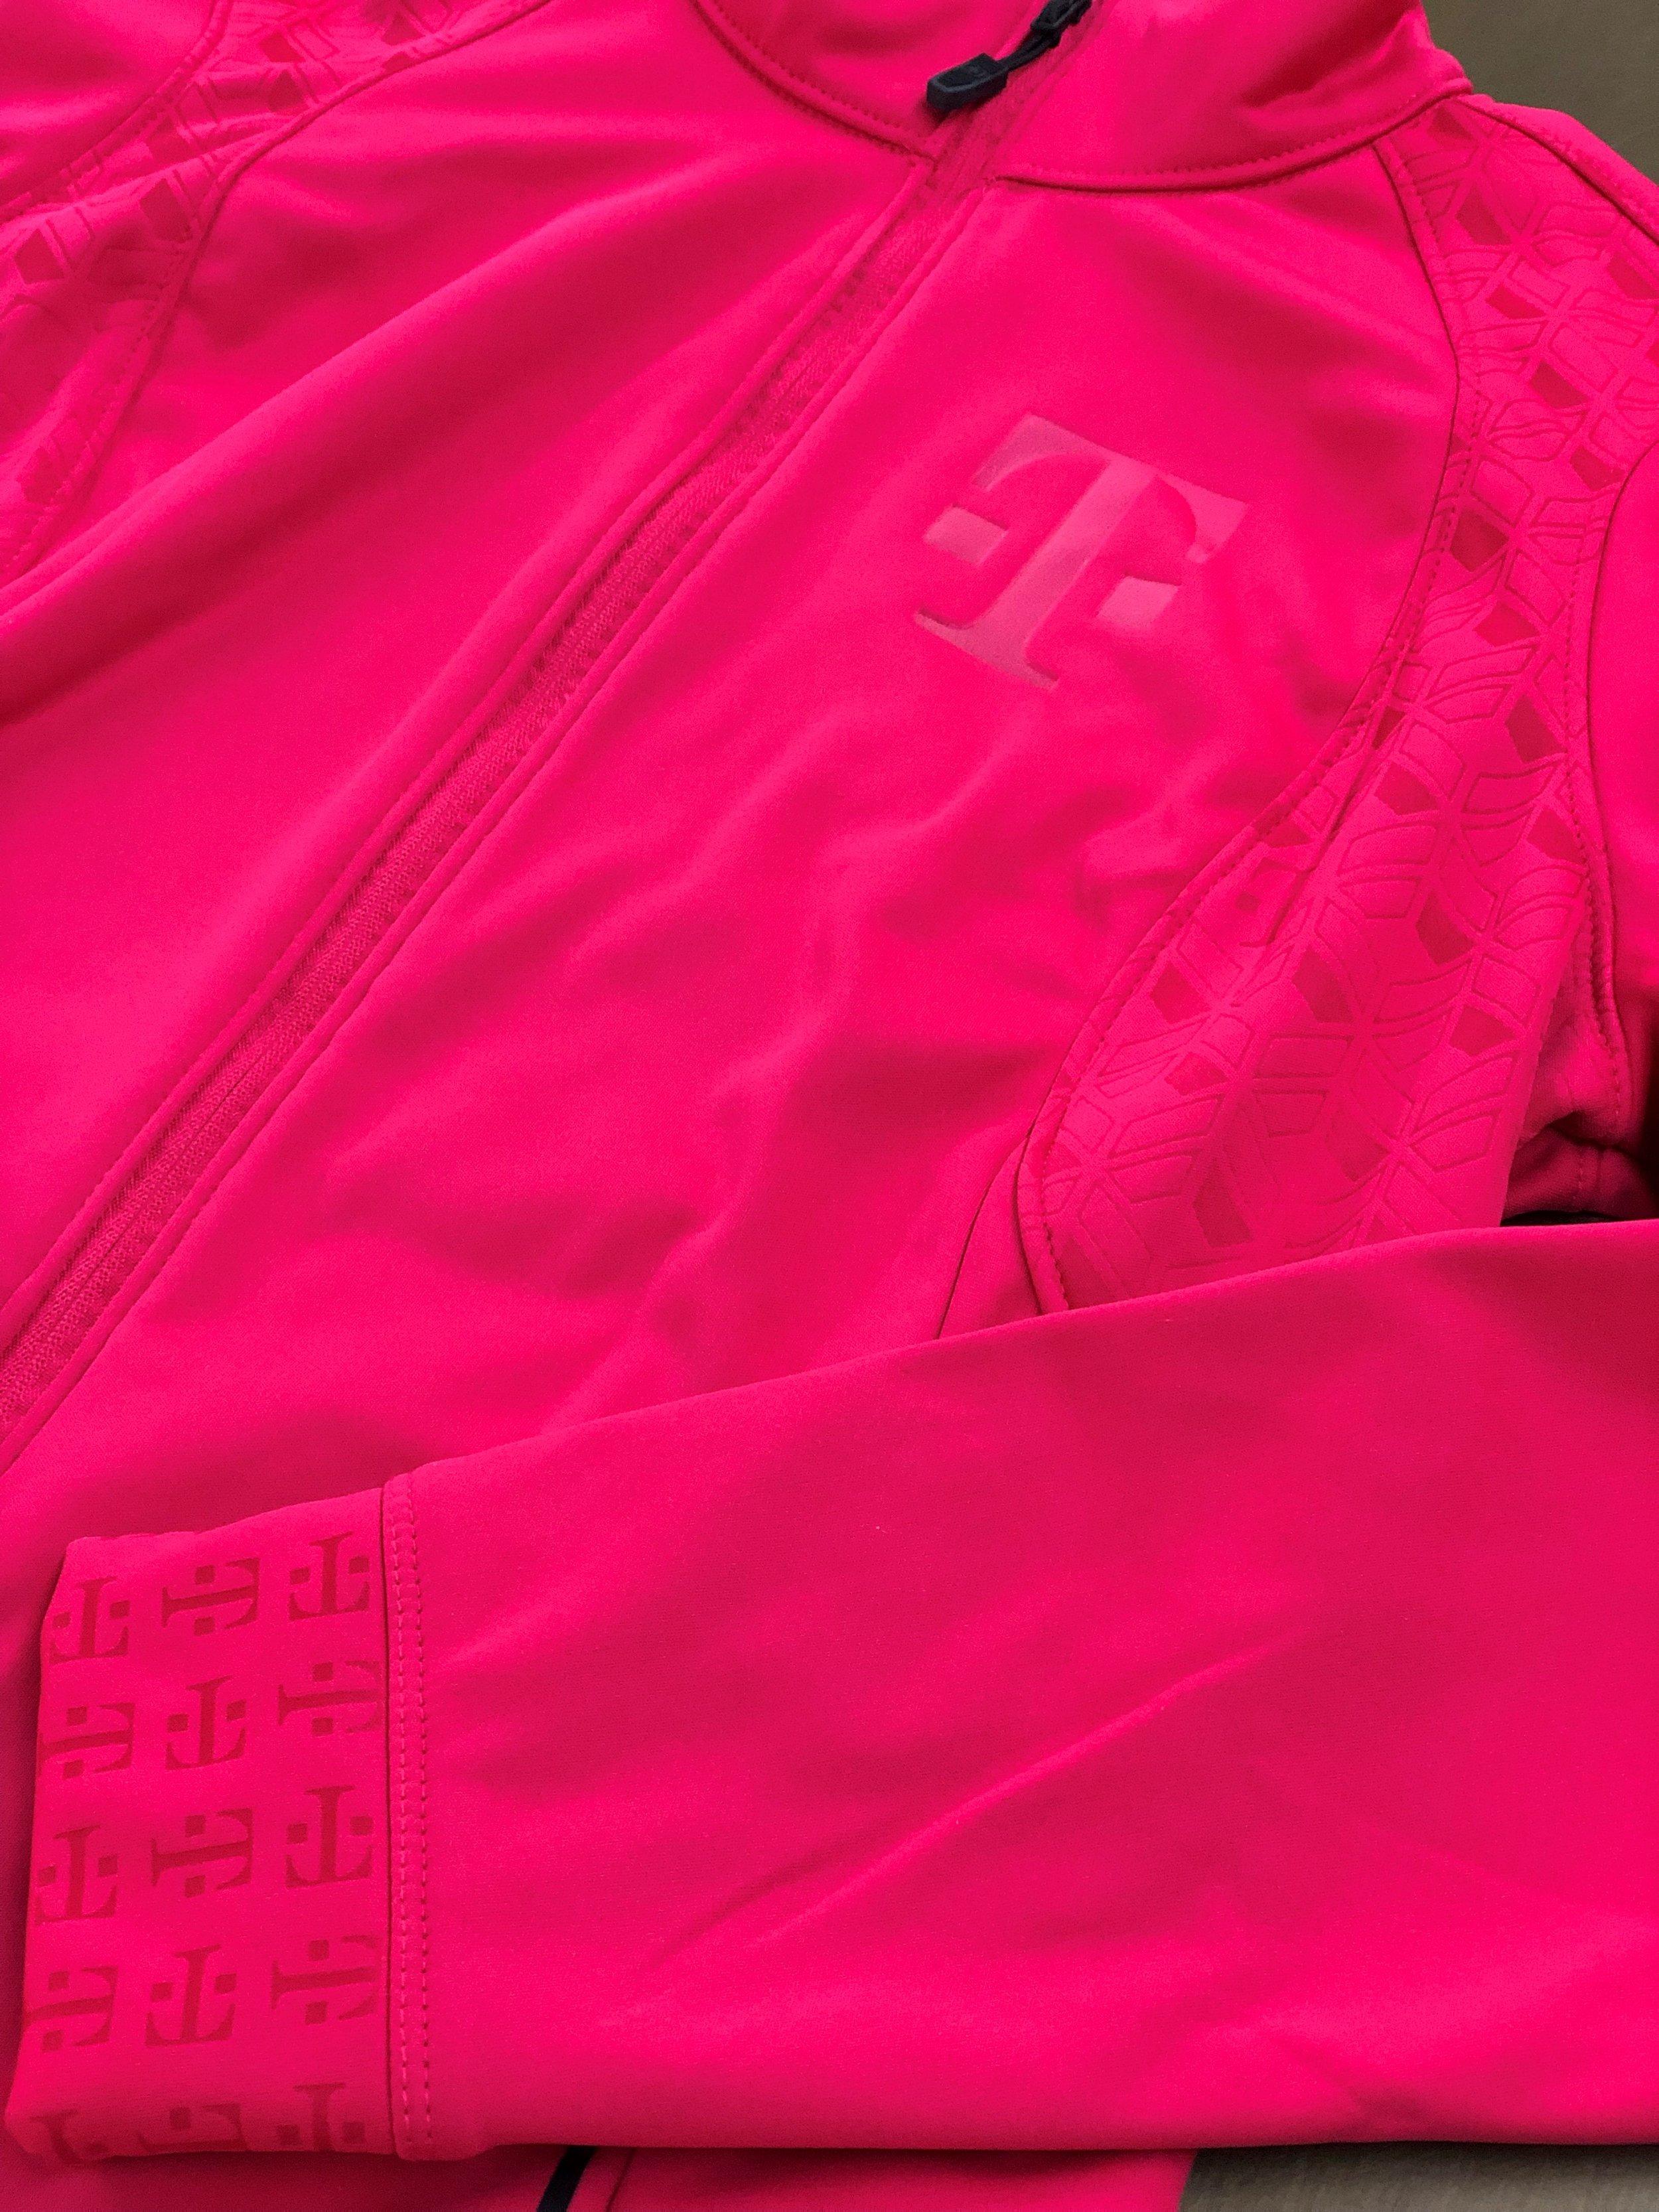 logounltd_laser_embroidery_screen_printing_apparel_uniform_custom_tshirts_kirkland_bellevue_seattle_redmond_branded_merchandise_promotional_products_logo_unltd_t_mobile_Tuesday_tmobile_un_carrier_magenta_5G_john_lege.jpg